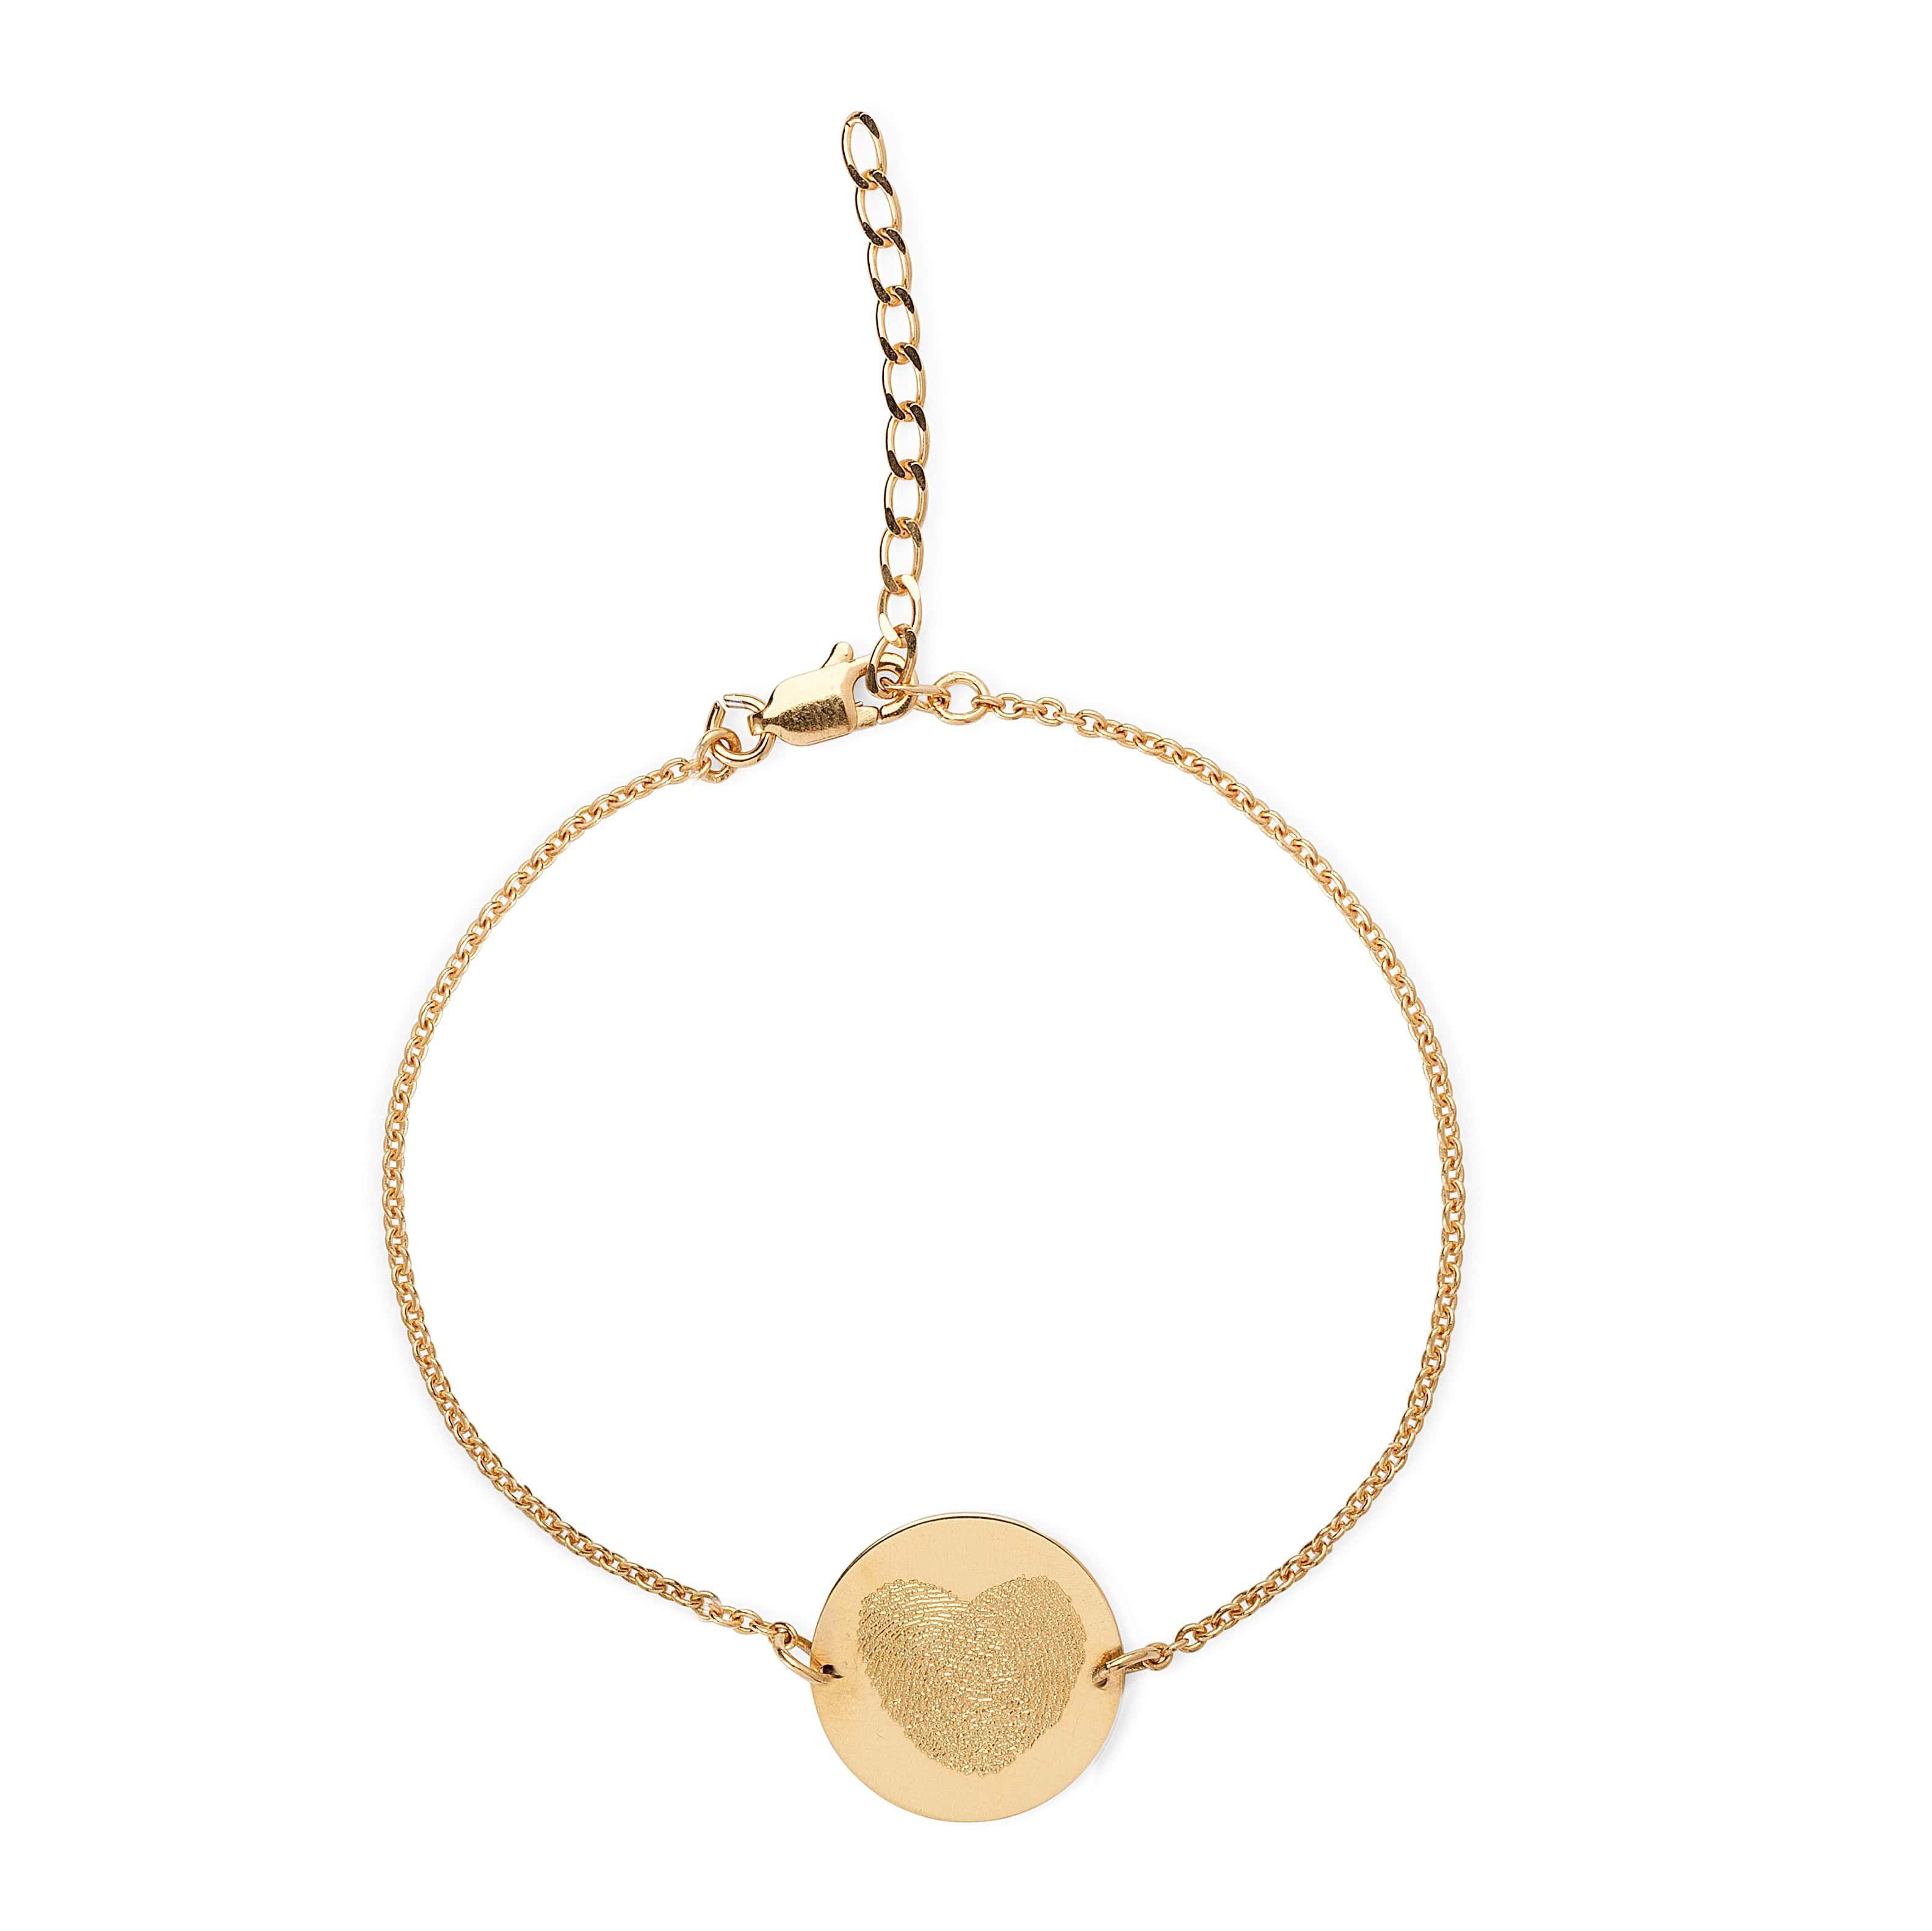 Fingerprint coin bracelet comes in yellowrosewhite gold u sterling